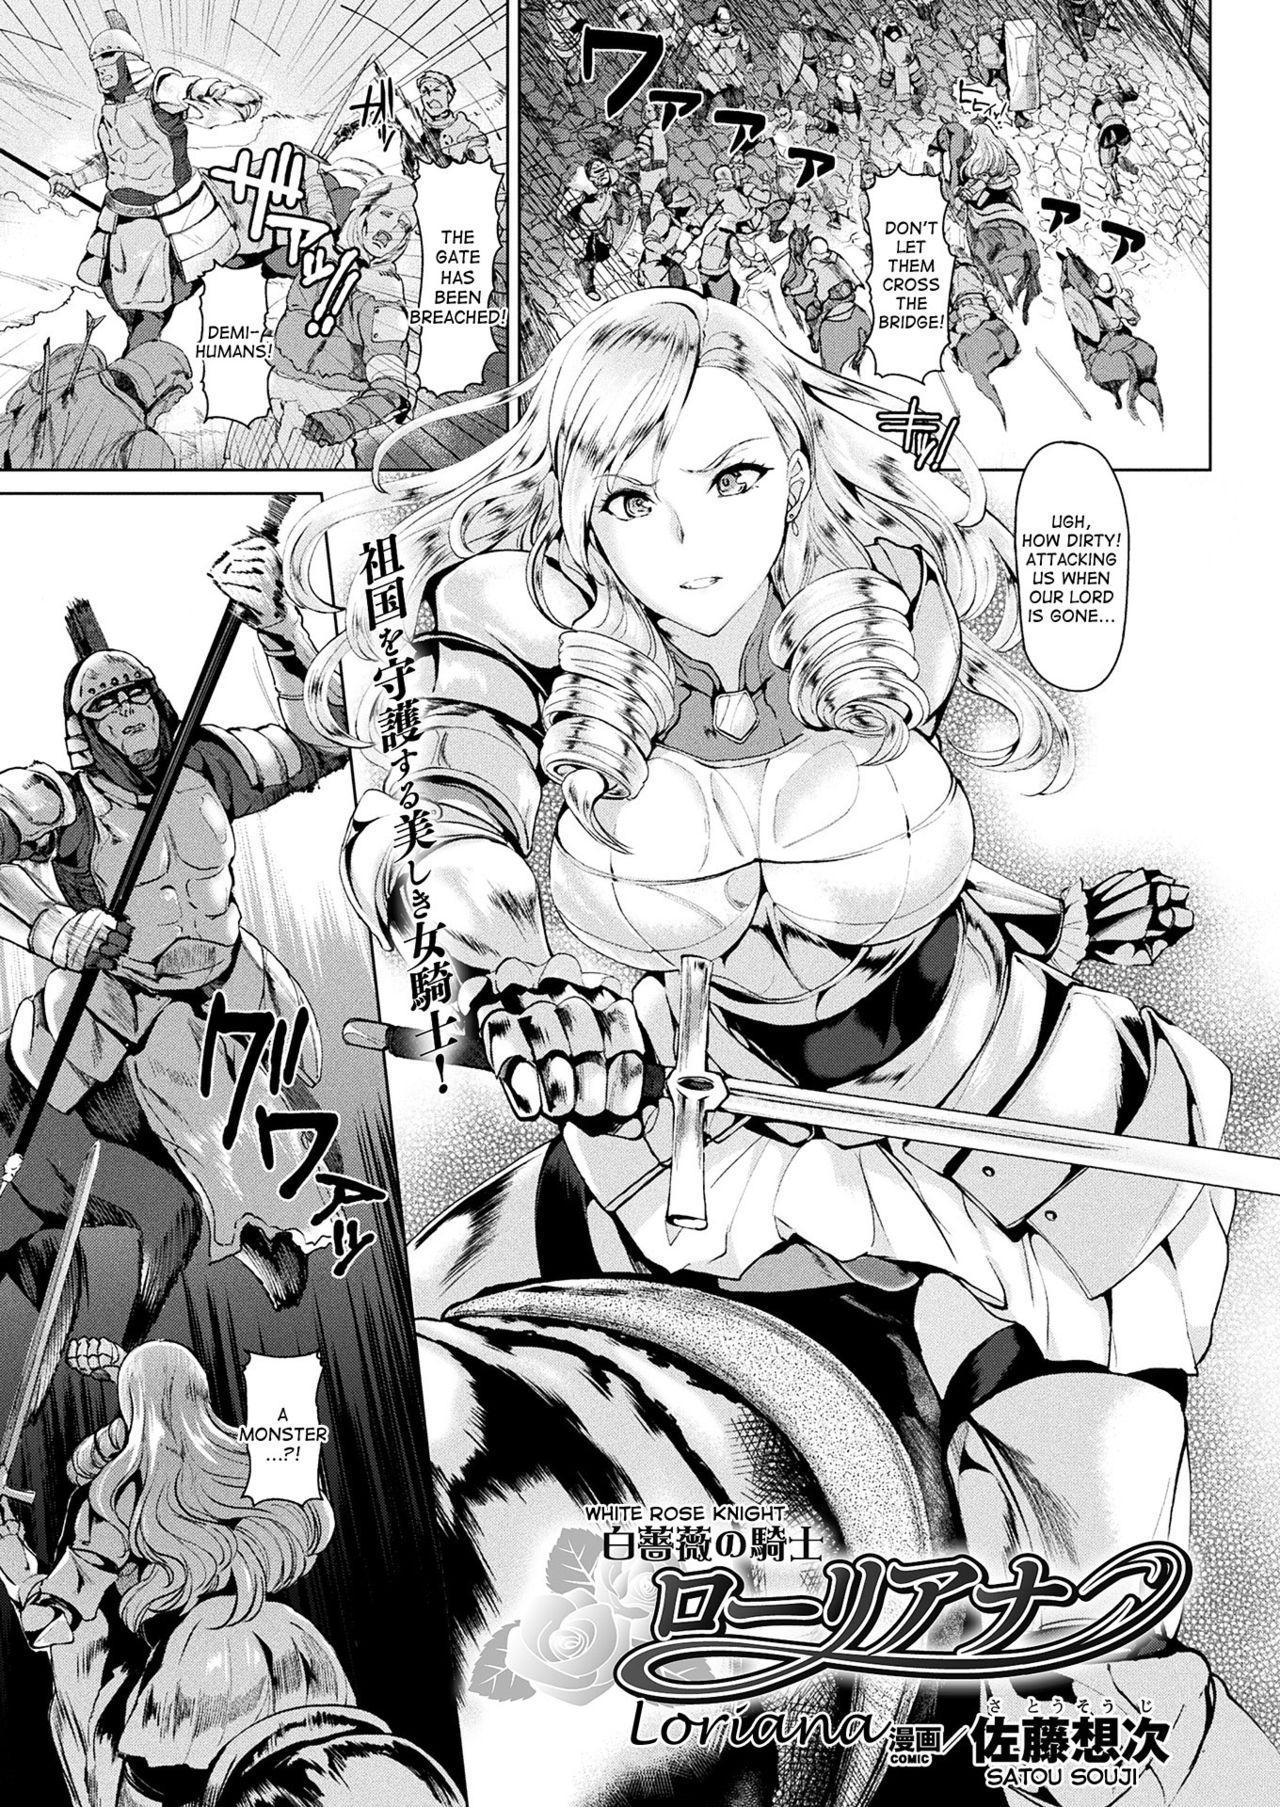 Shiro Bara no Kishi Loriana   White Rose Knight Loriana 0